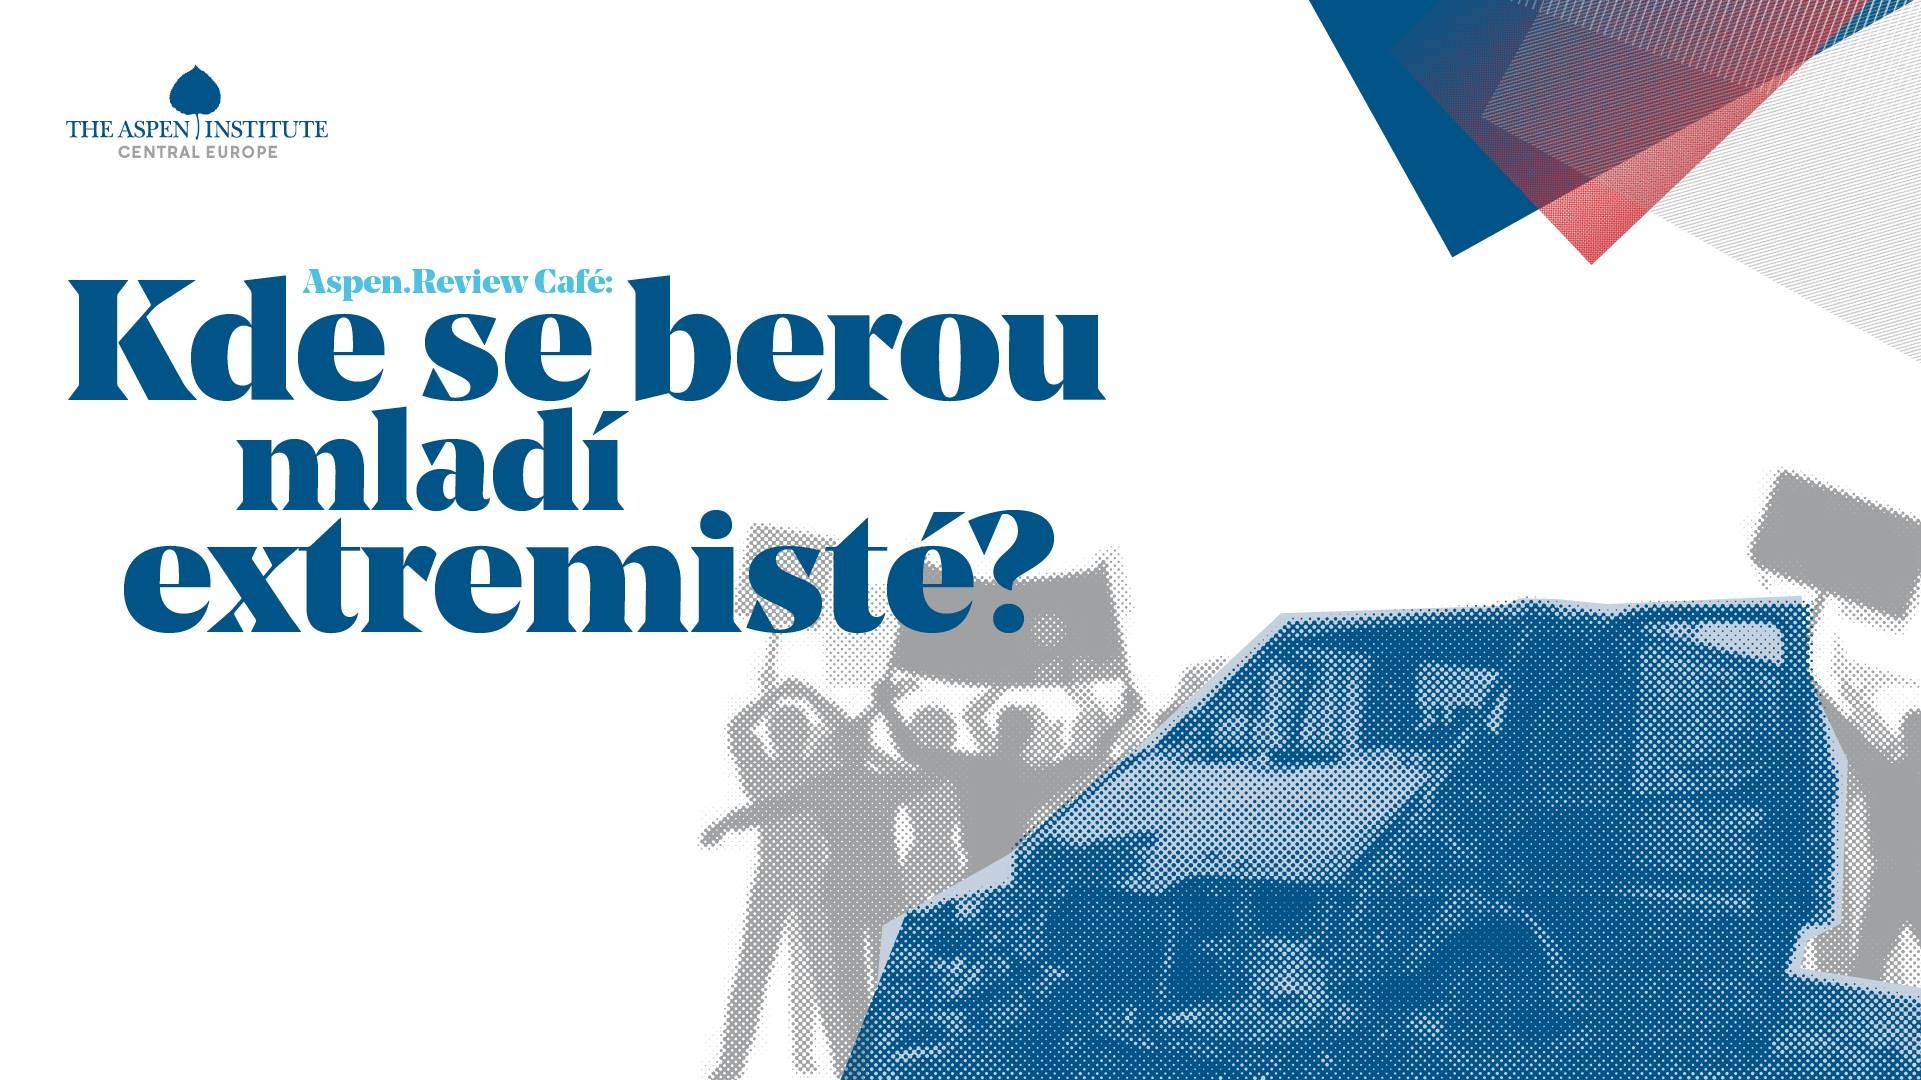 ST / 24. 5. / 17.00 / Kde se berou mladí extremisté?: Aspen.Review Café / diskuse